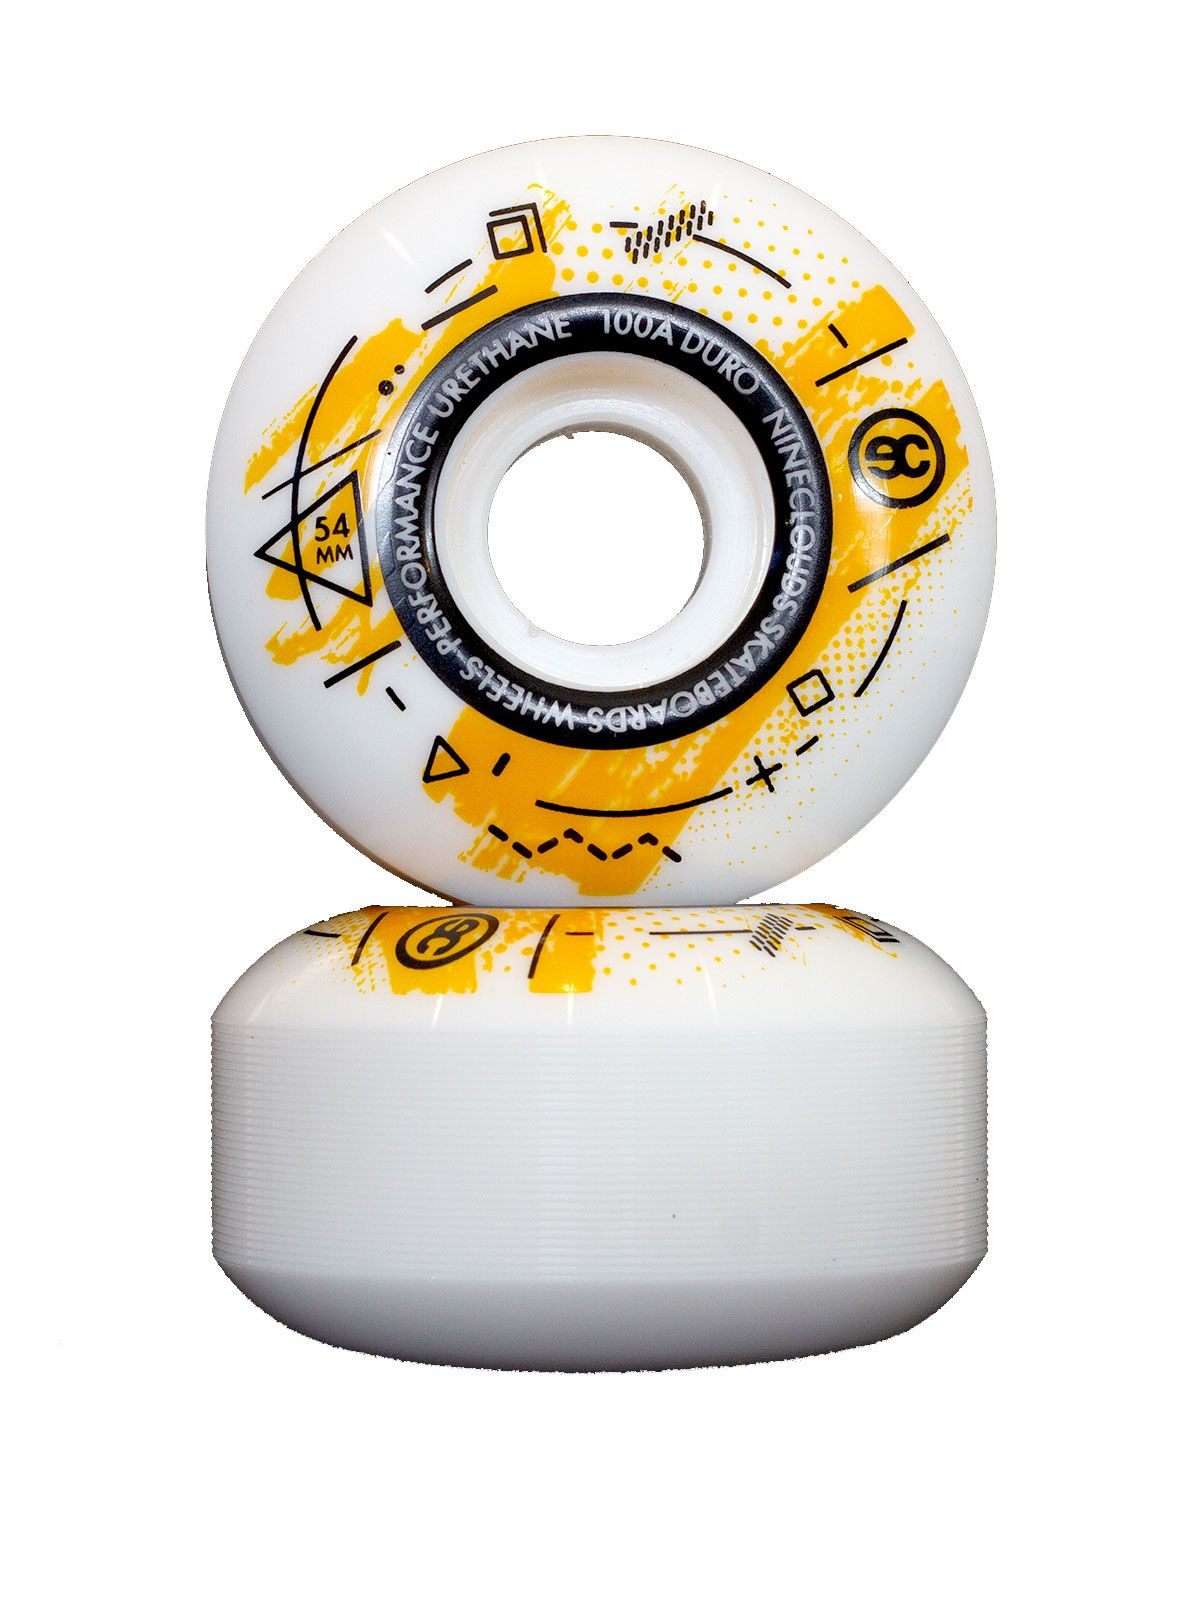 rodas-nineclouds-neon-54-1-image